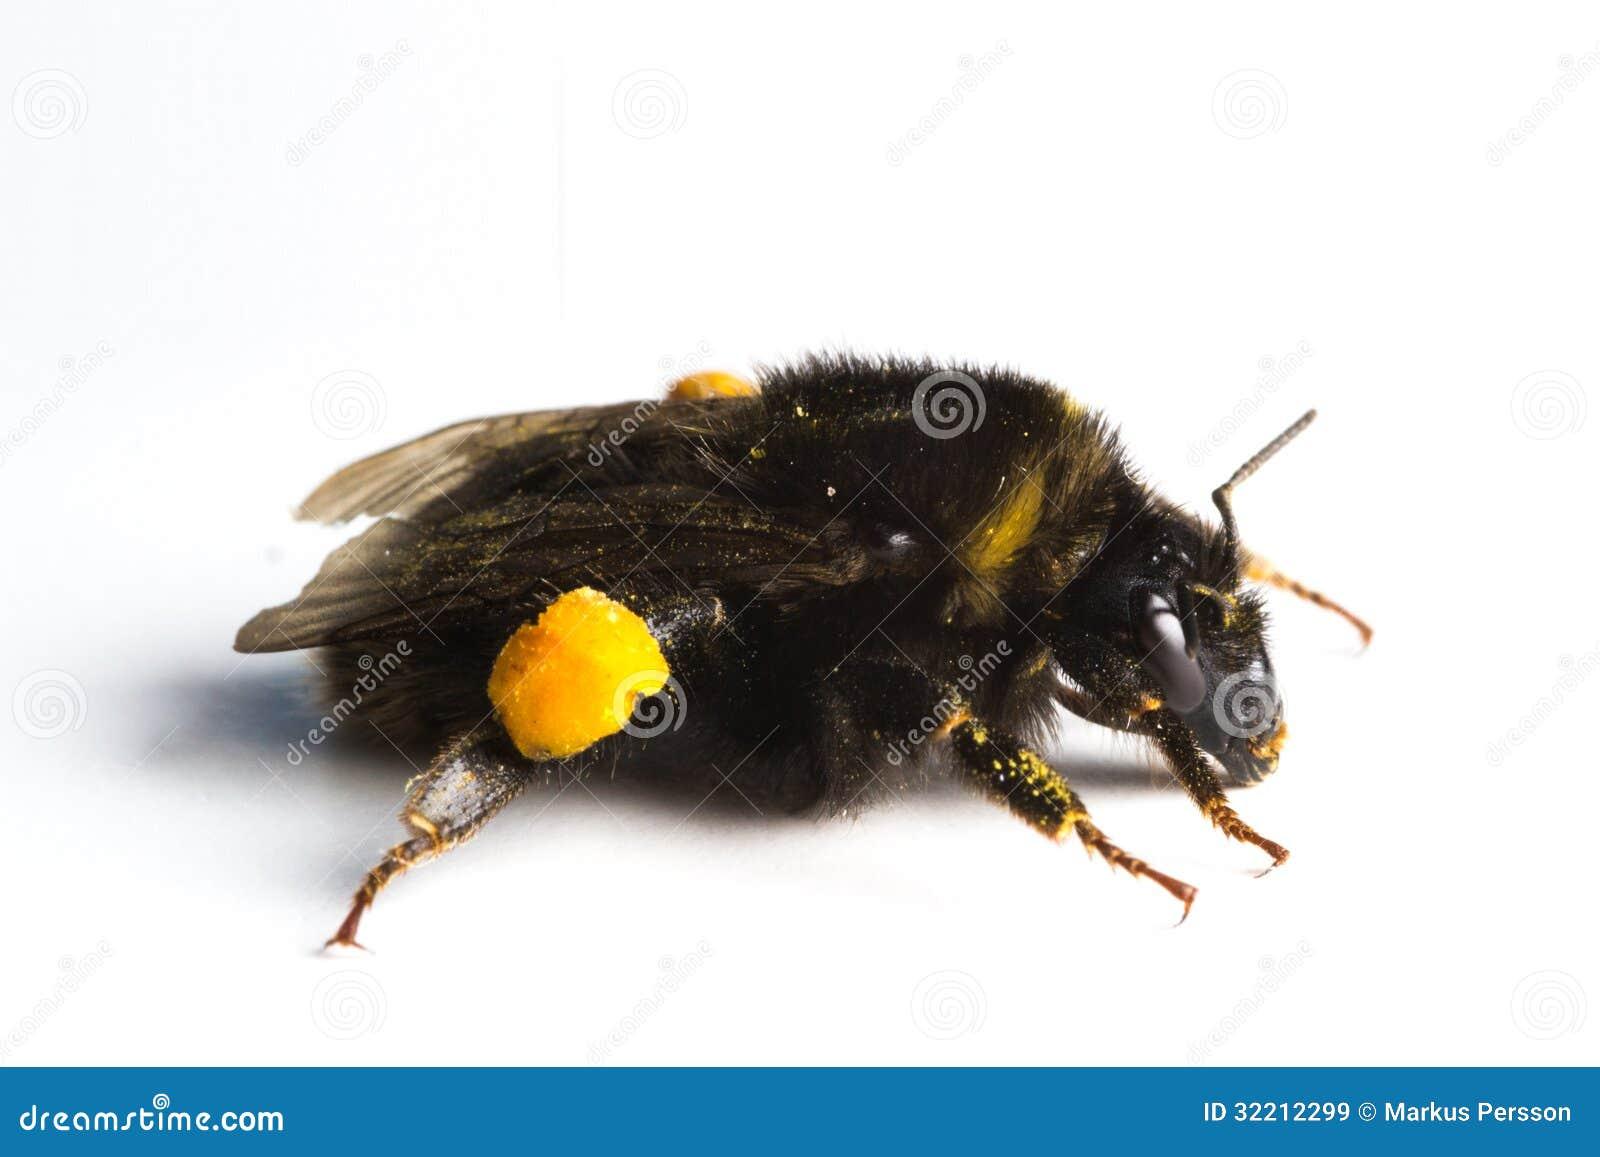 bumblebee bombus terrestris royalty free stock images image